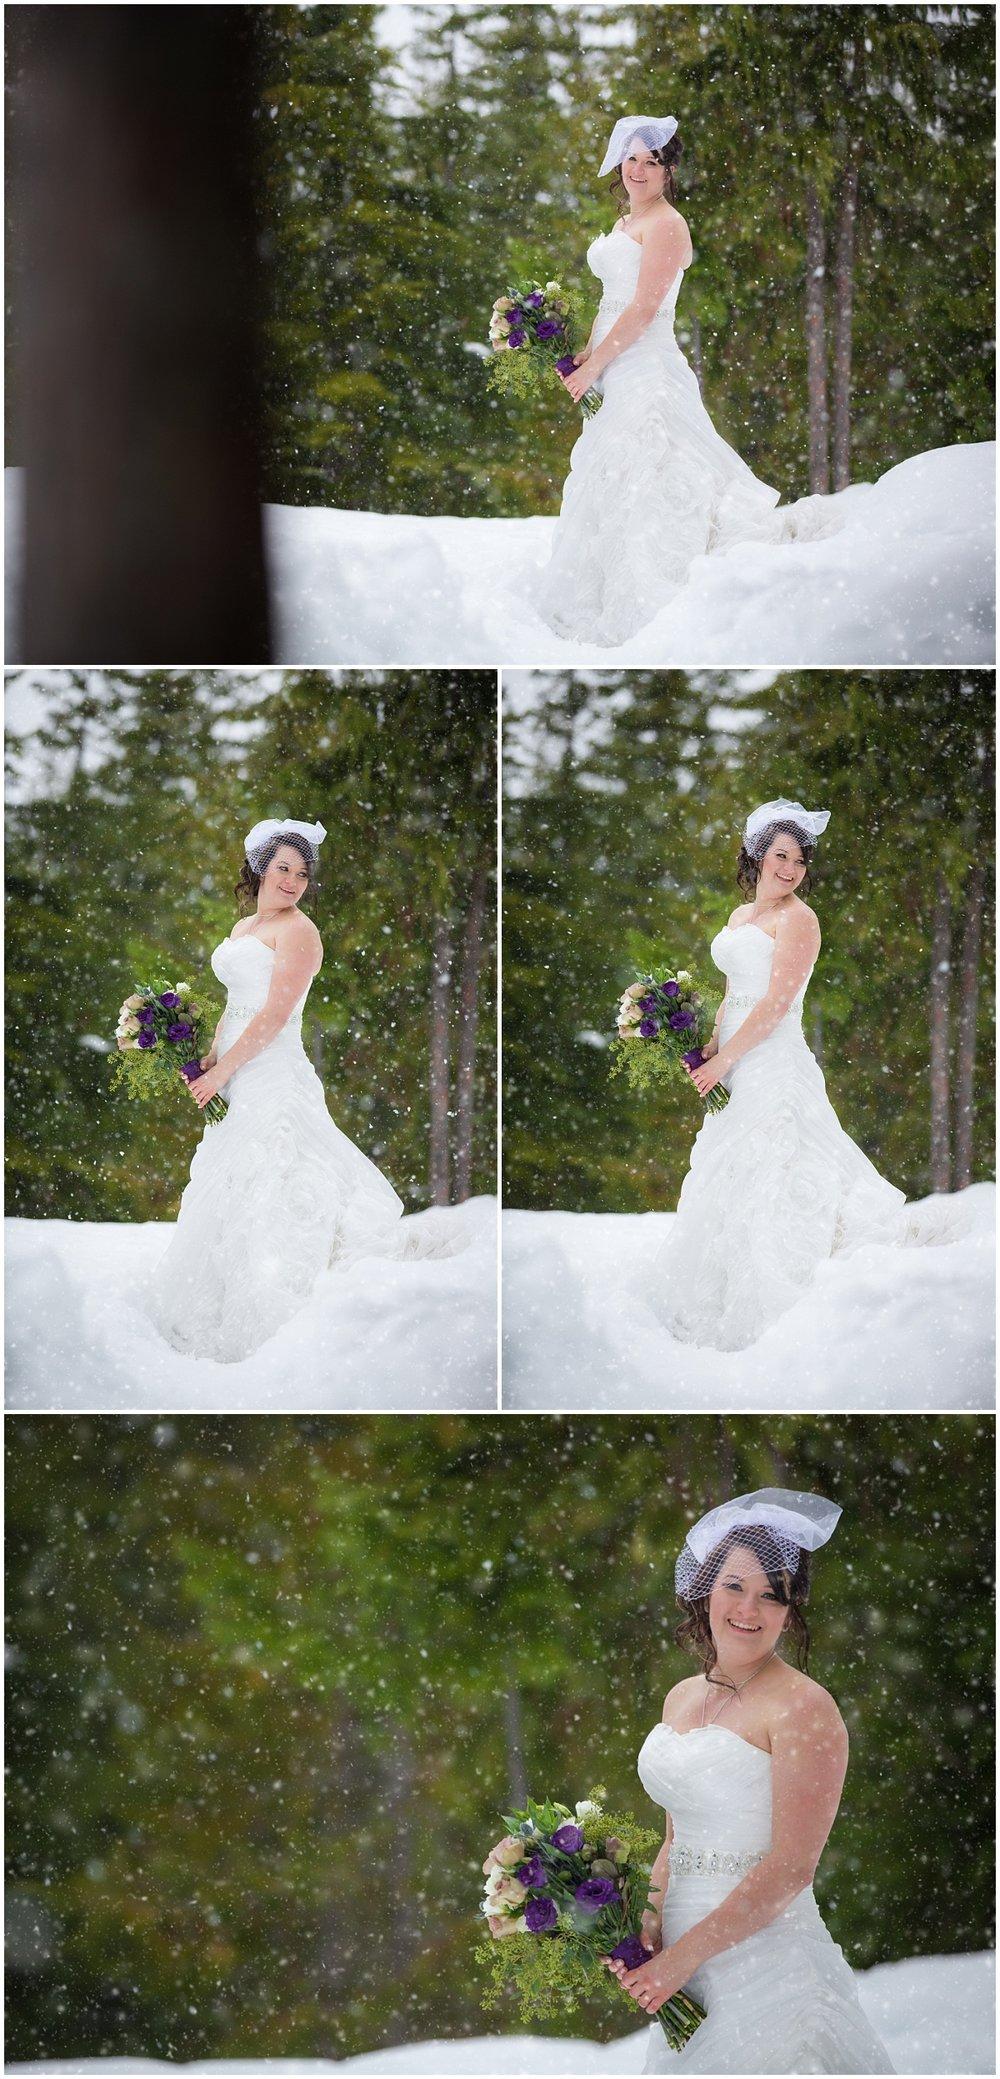 Amazing Day Photography - Squamish Wedding - Howe Sound Inn Wedding - Sea to Sky Gondola Wedding - Squamish Wedding Photographer - Winter Wedding - Snowy Wedding (17).jpg